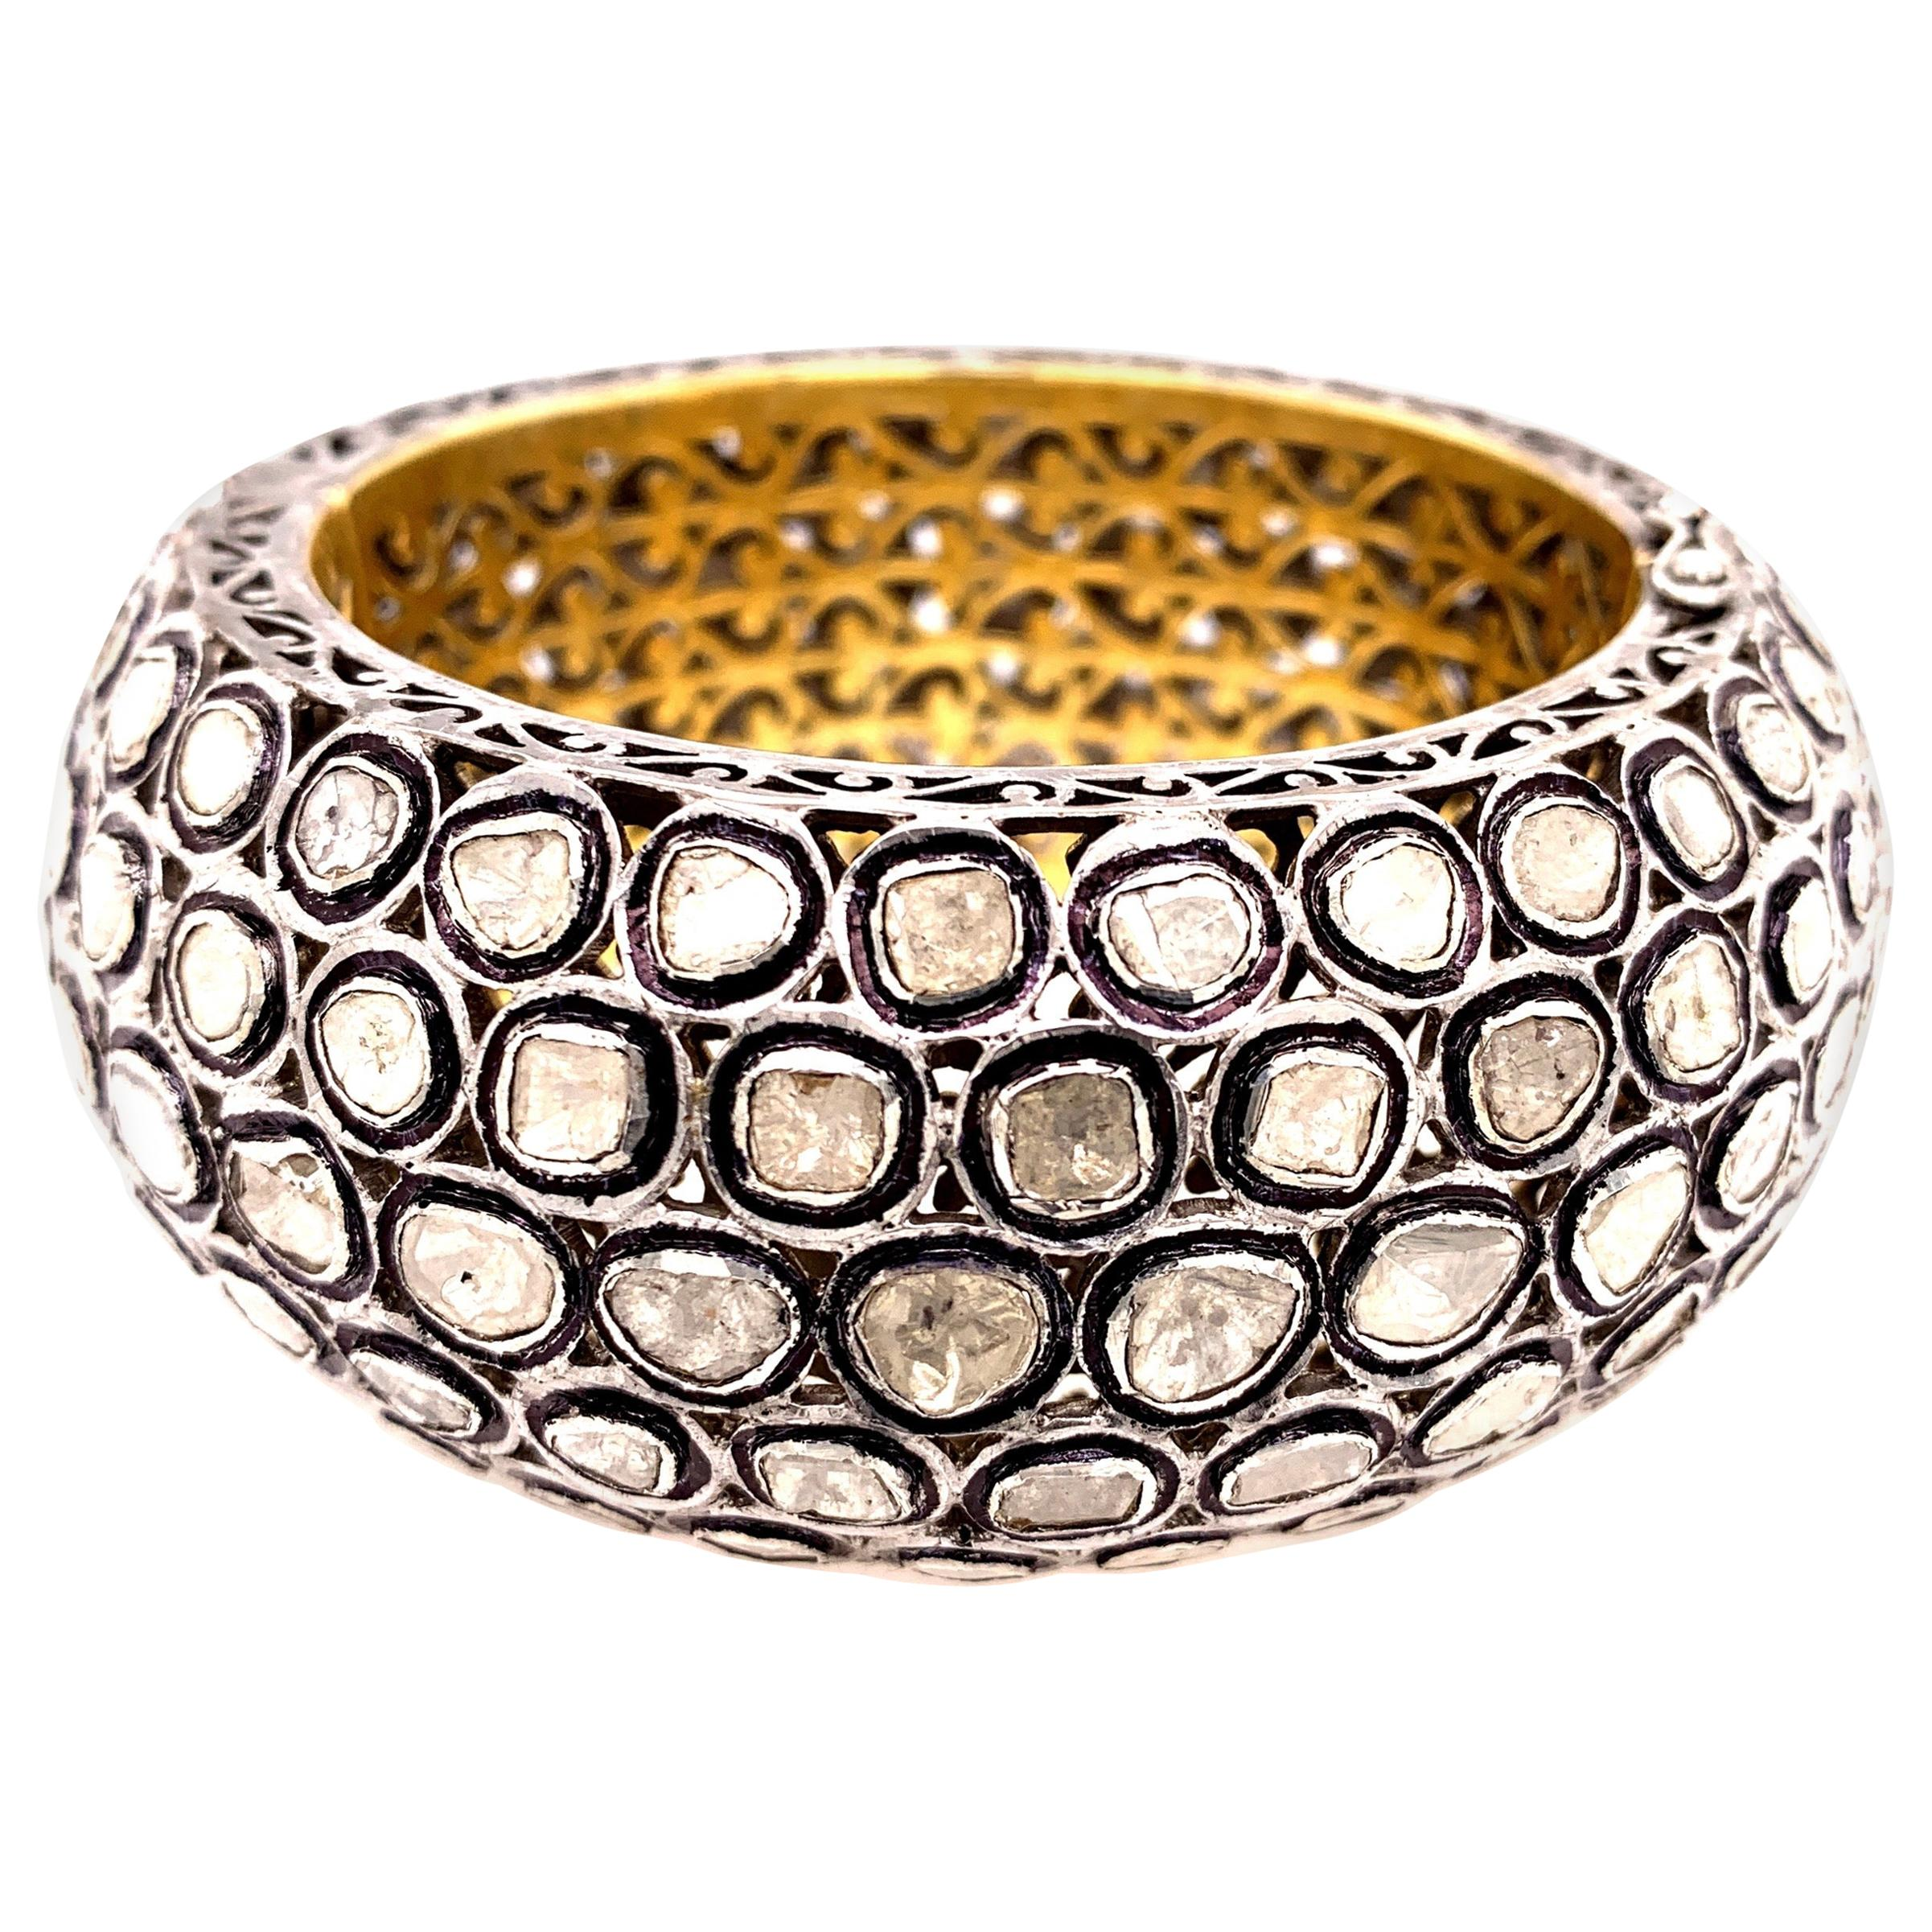 Maharaja 25 Carat Diamond Silver Gold Bangle Bracelet